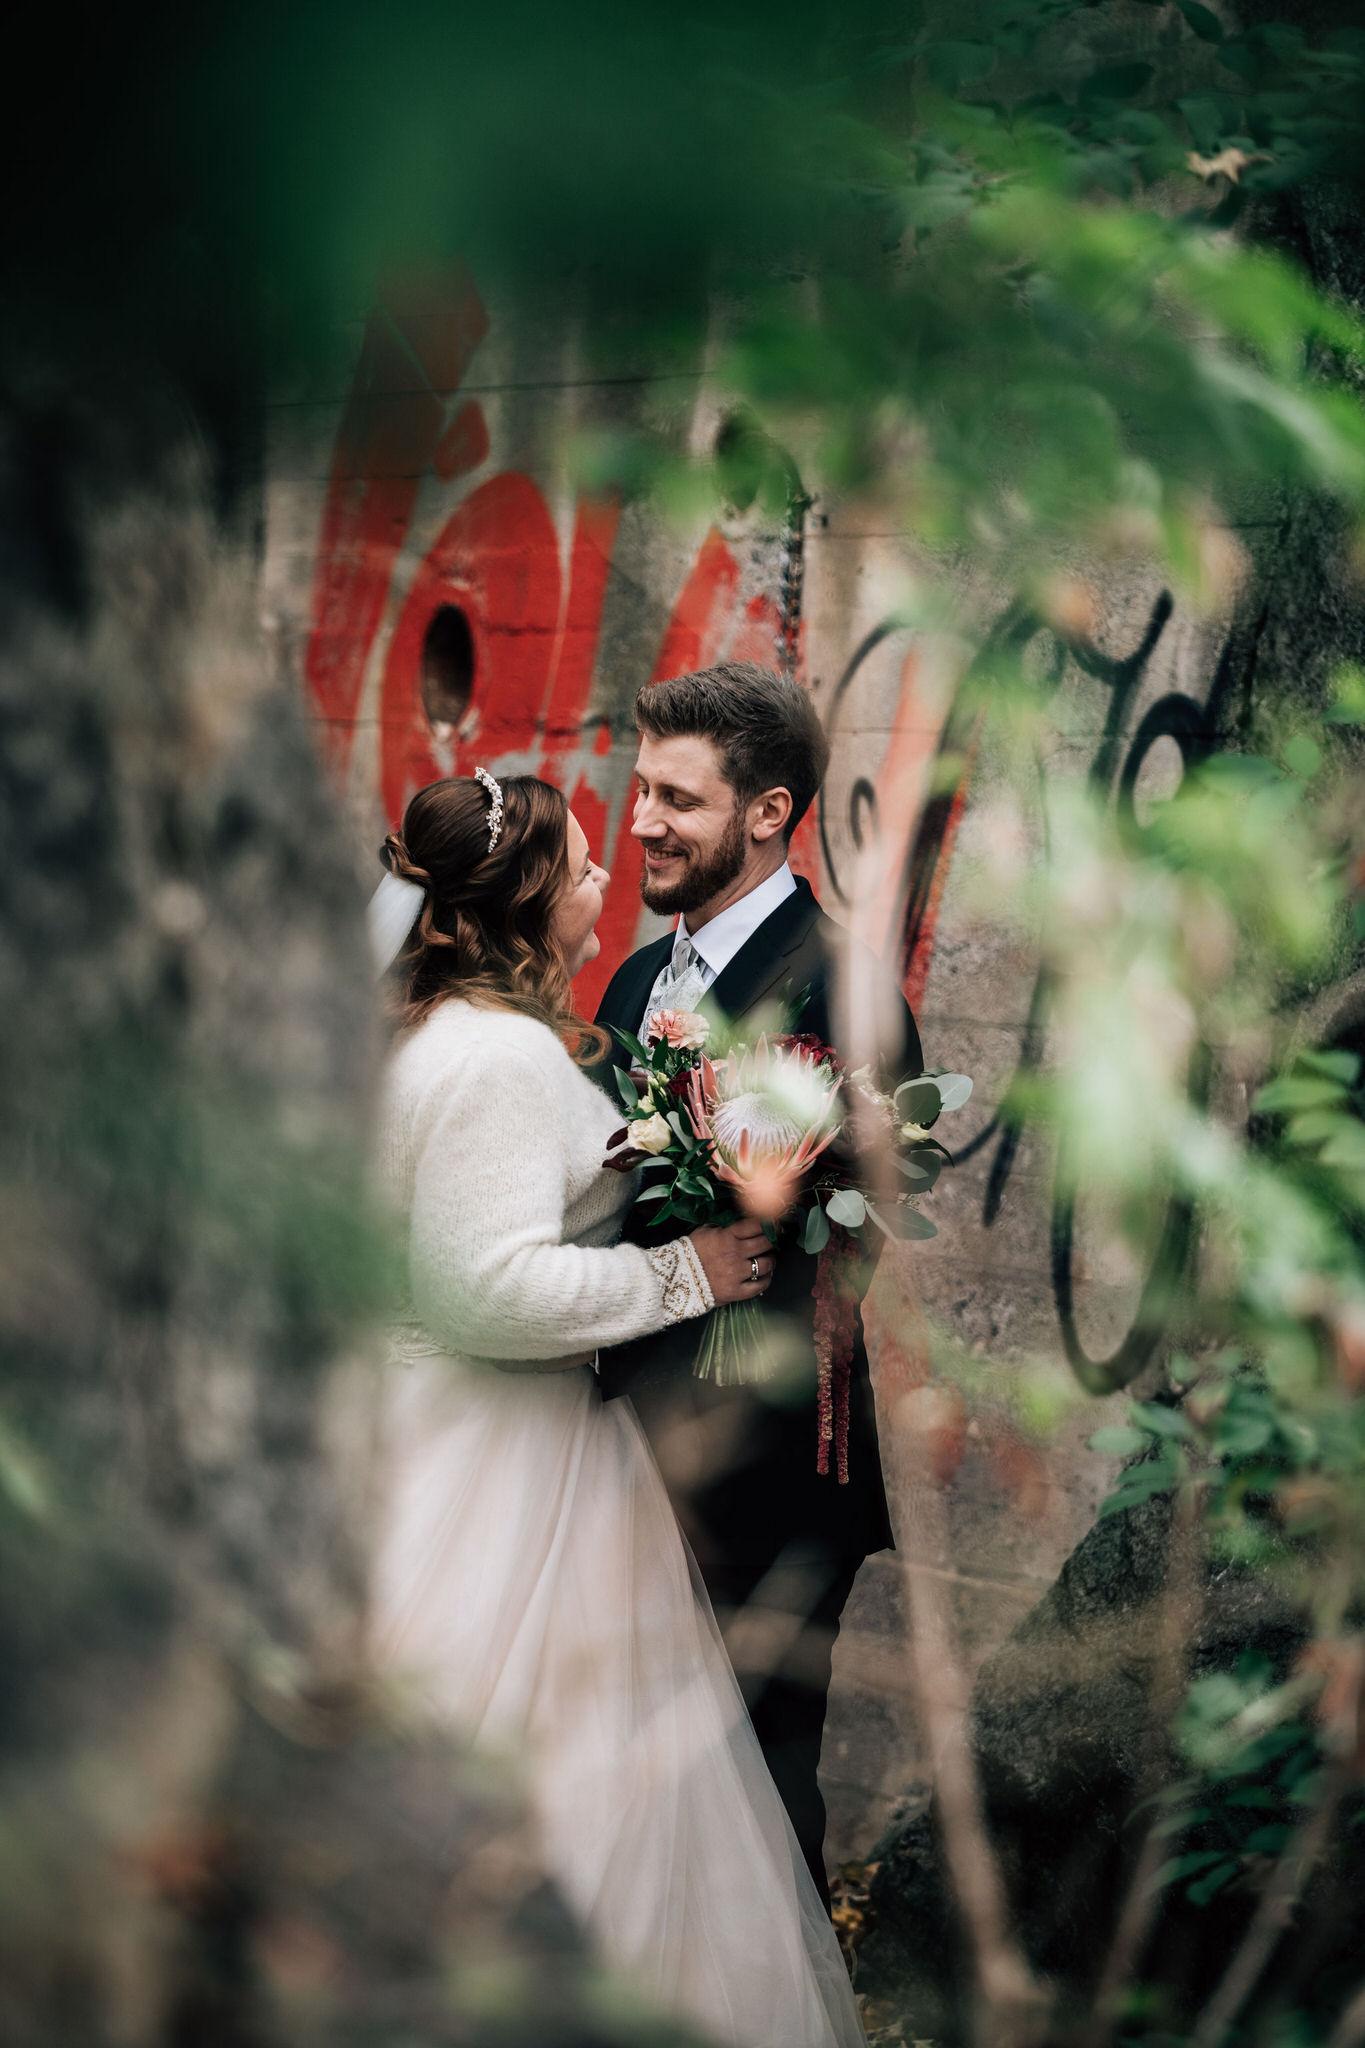 _N857936_fotografering_larvik_bryllup_aspargesgarden_.jpg